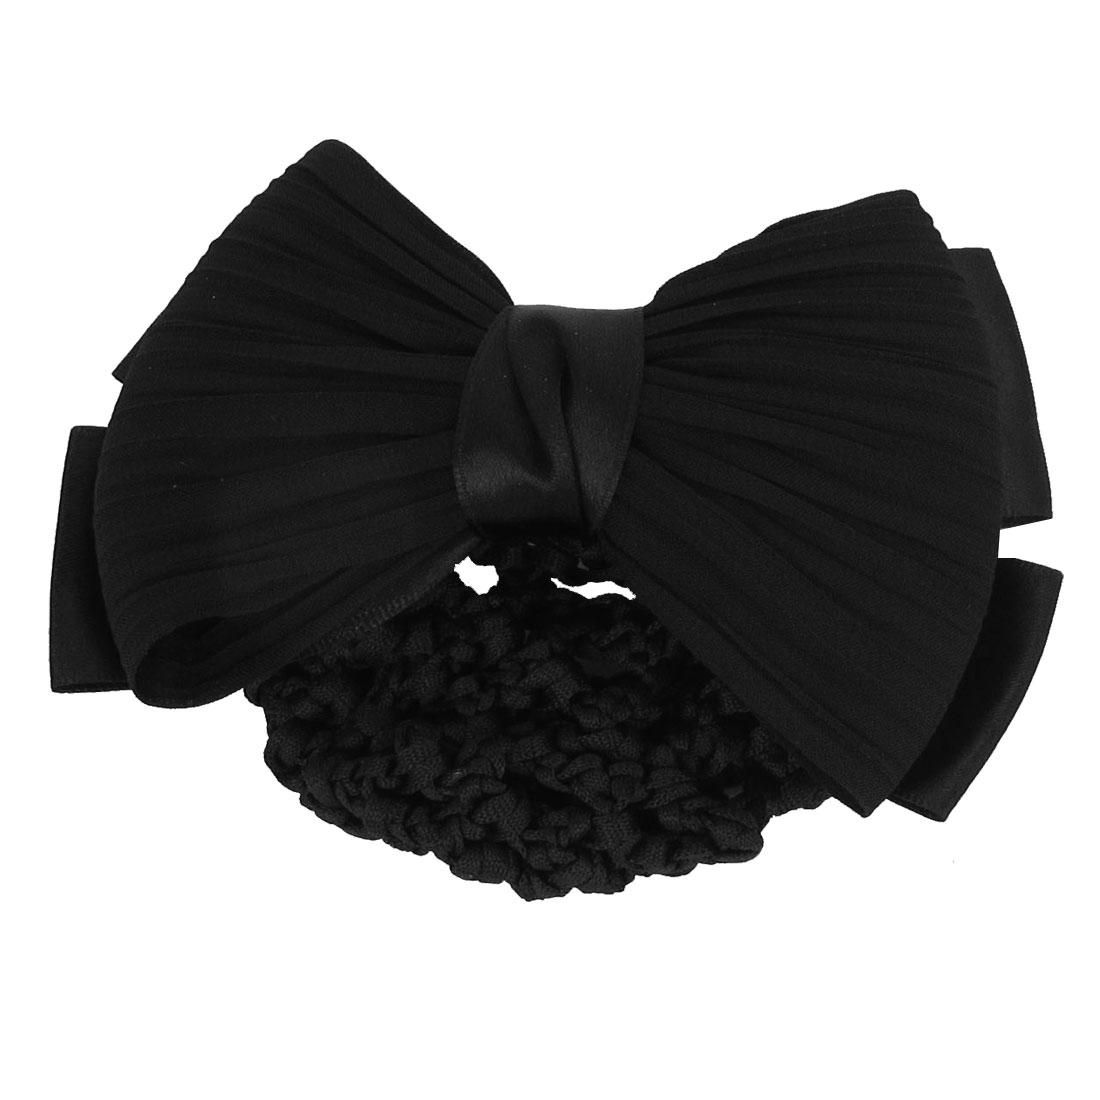 Black Bowknot Decor Snood Net Barrette Hair Clip Bun Cover